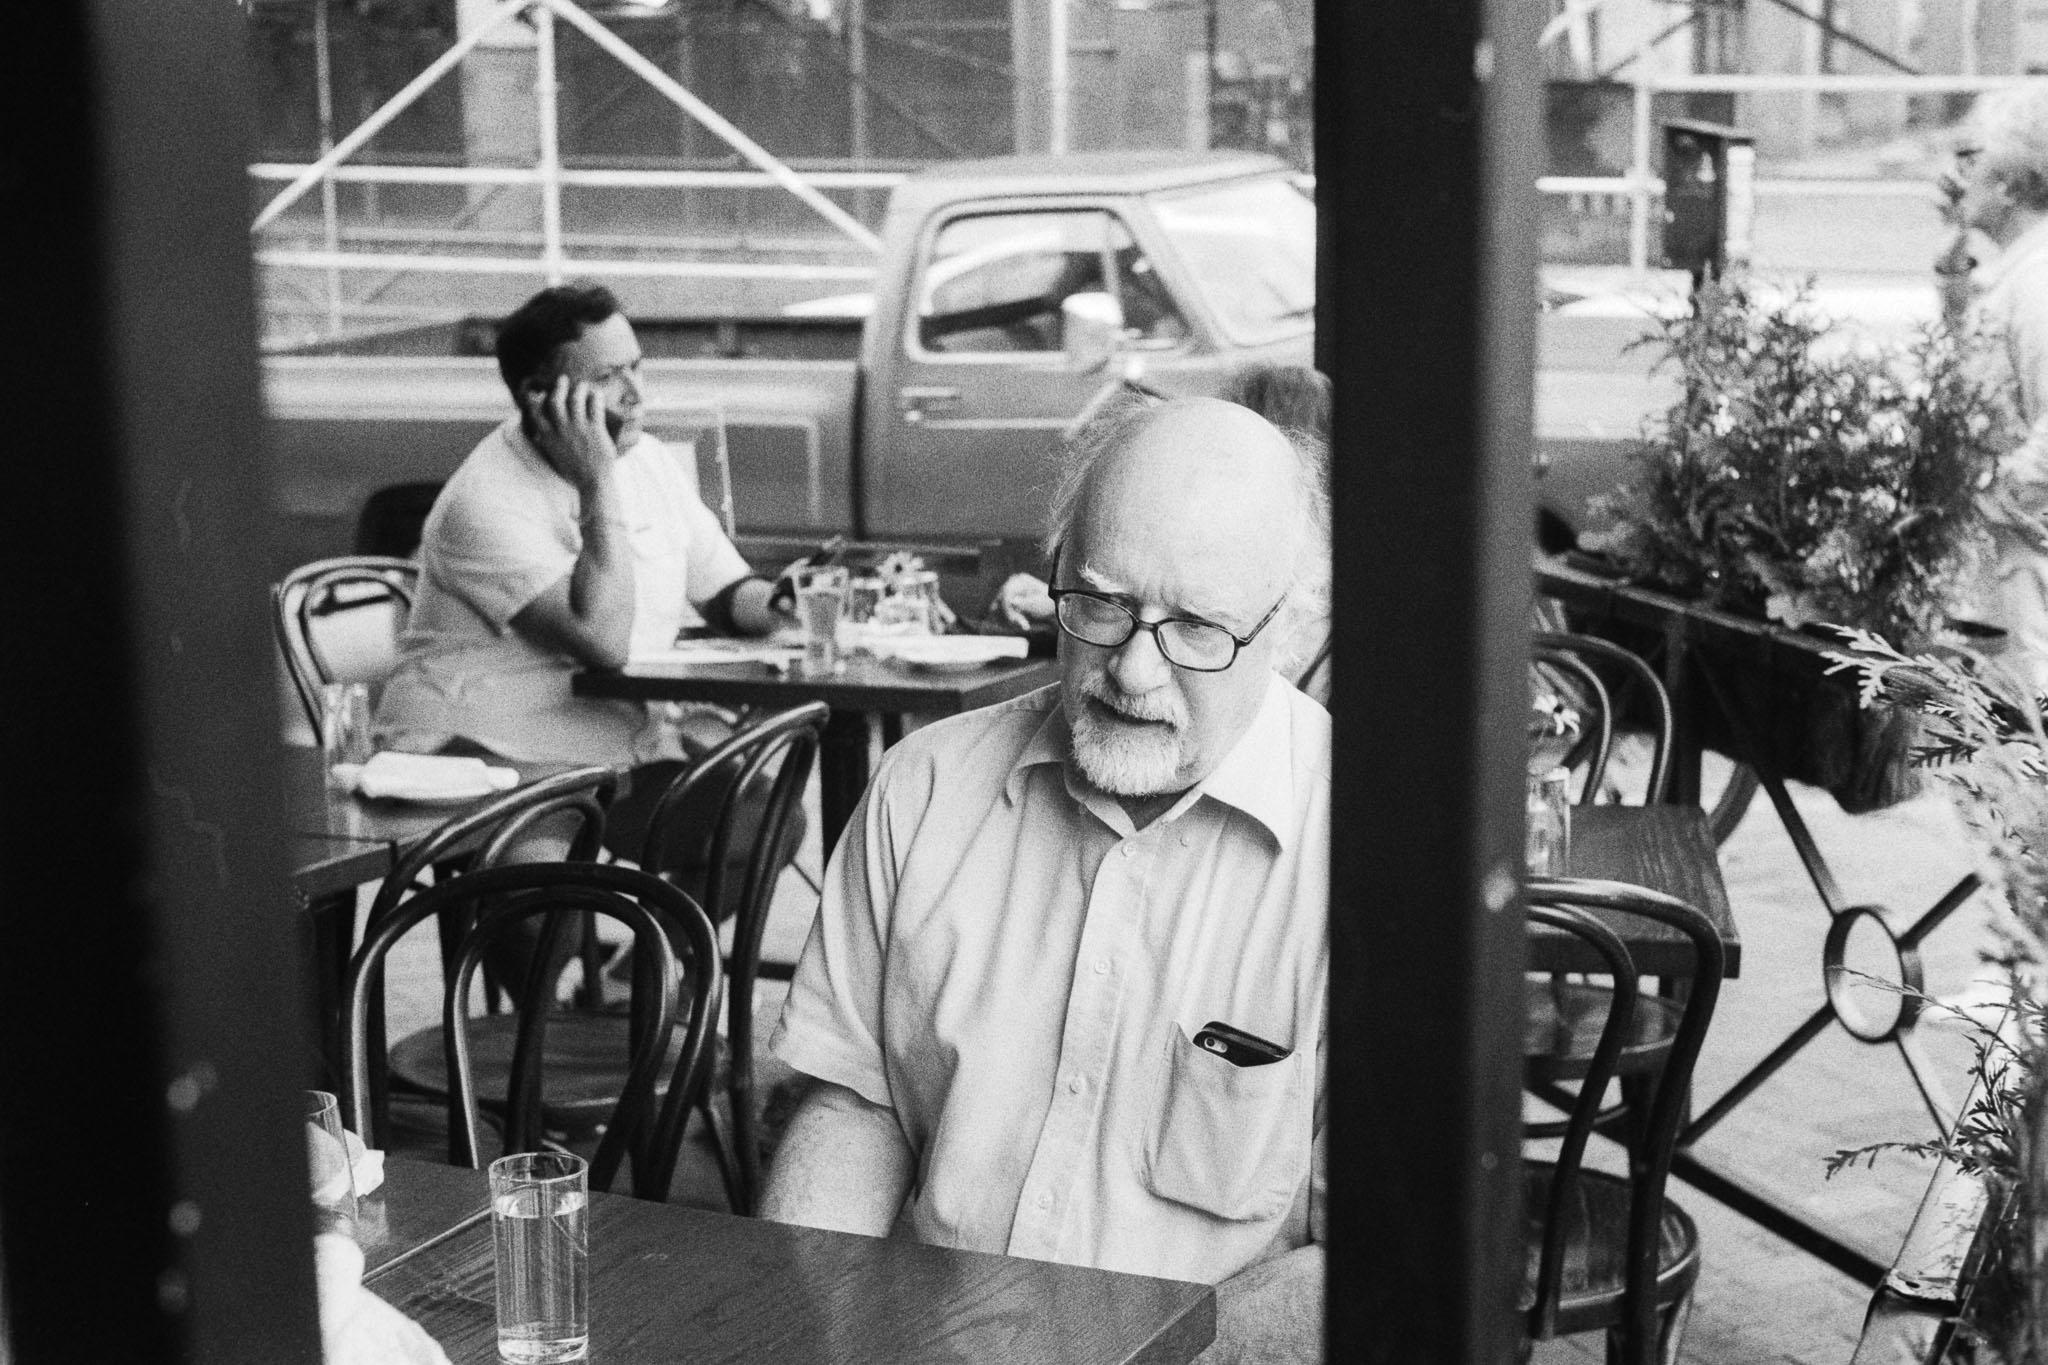 Camera: Leica M3  Lens:50mm 1.5 Summarit